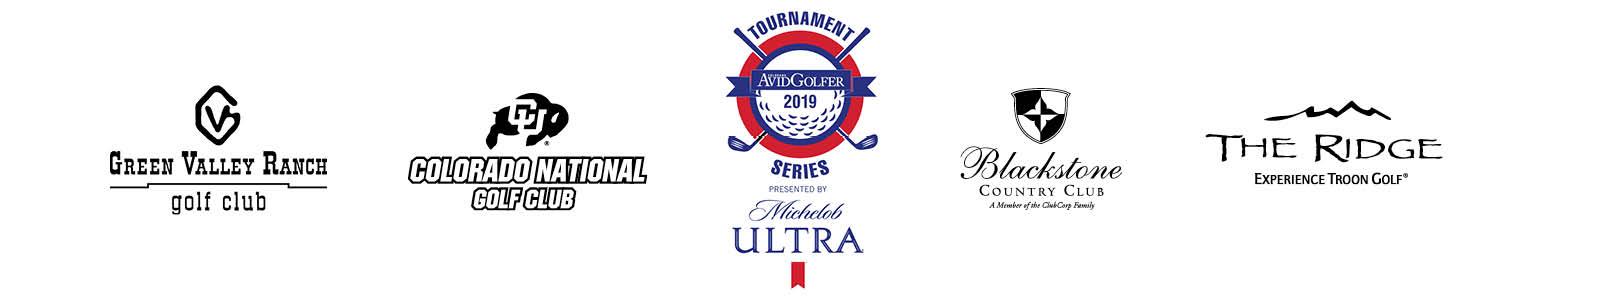 2019 Tournament Series Venue Bar